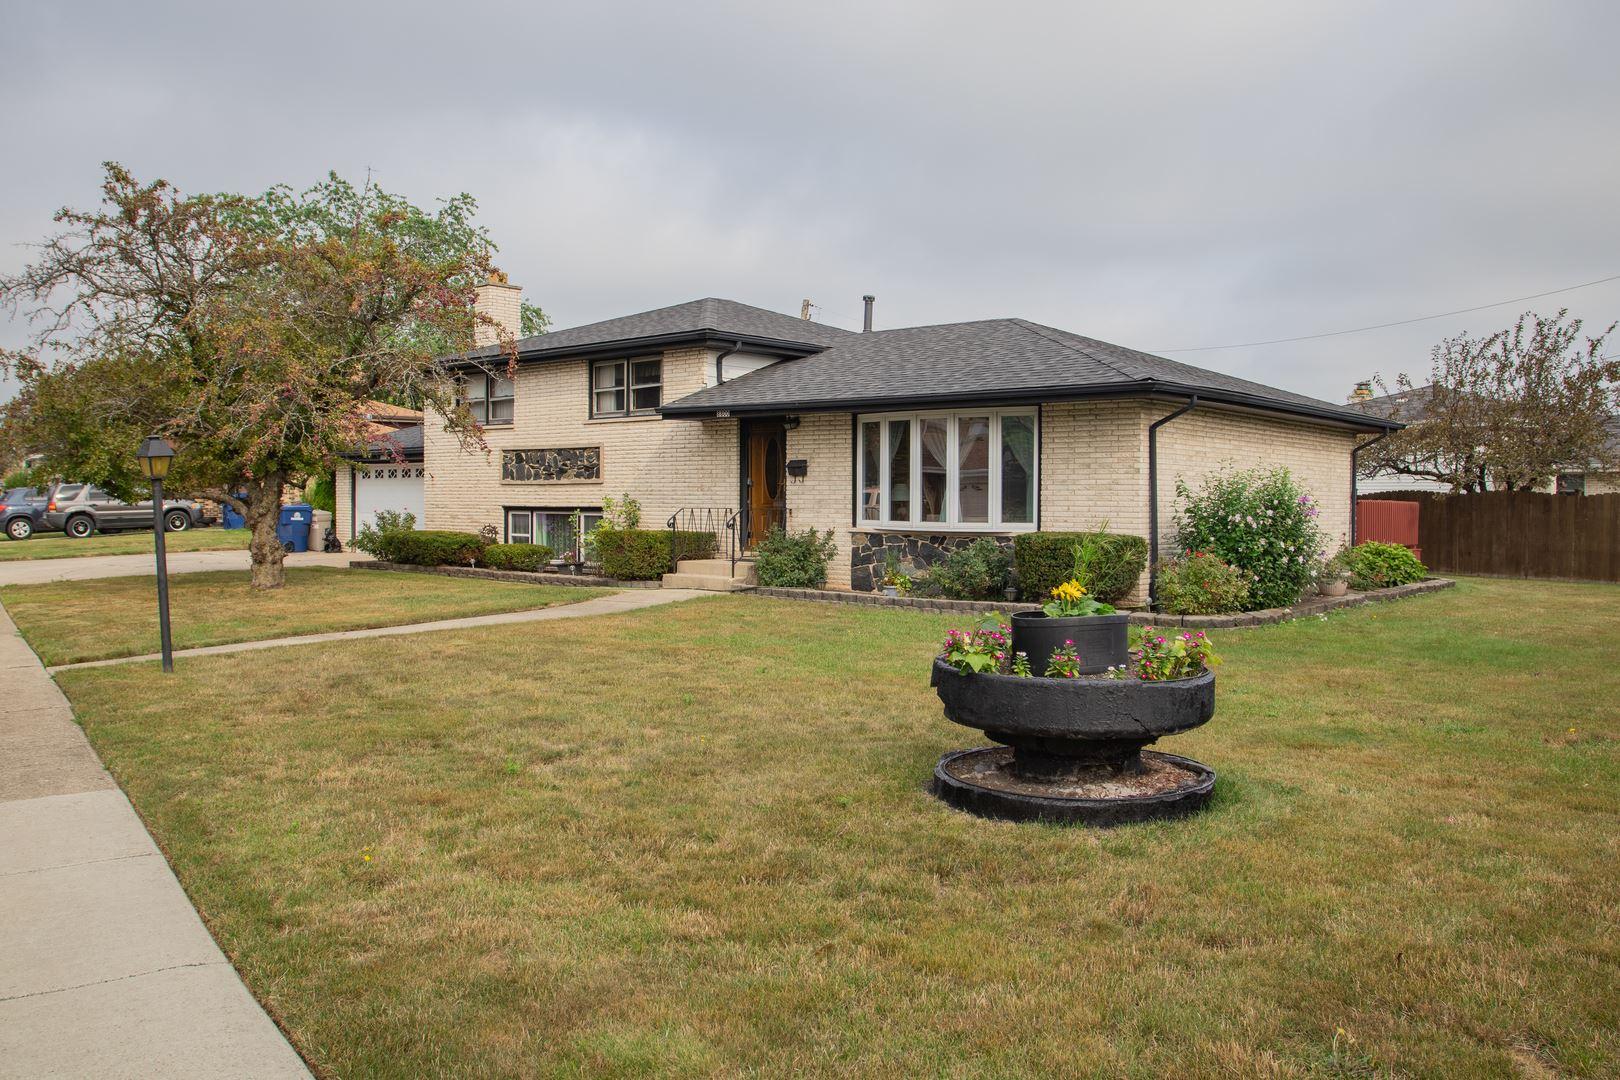 8800 Lotus Drive, Hickory Hills, IL 60457 - #: 11188231